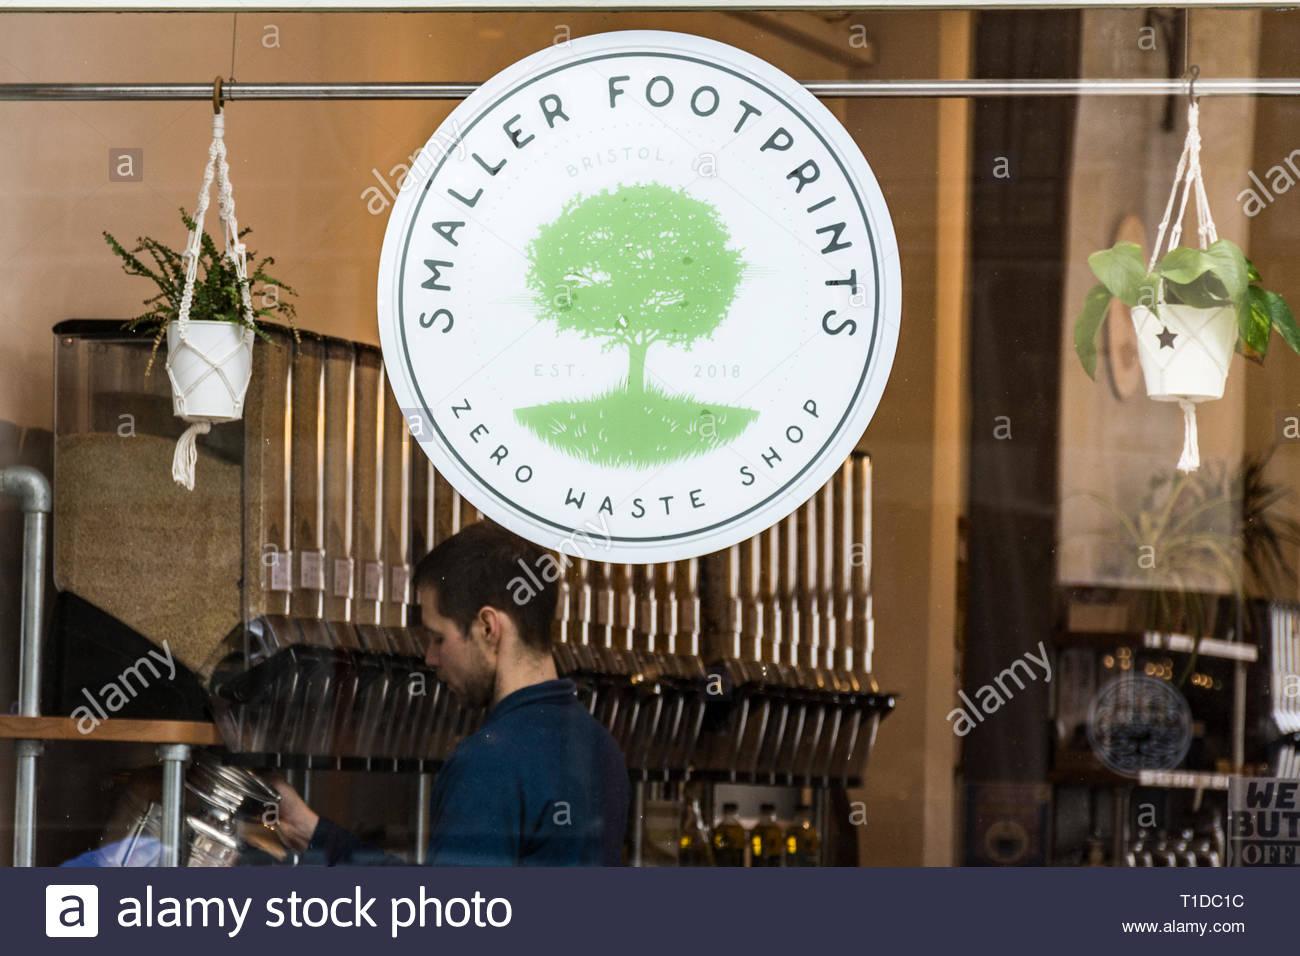 Smaller Footprints, a zero waste shop in Regent Street, Clifton Village, Bristol, England, UK - Stock Image